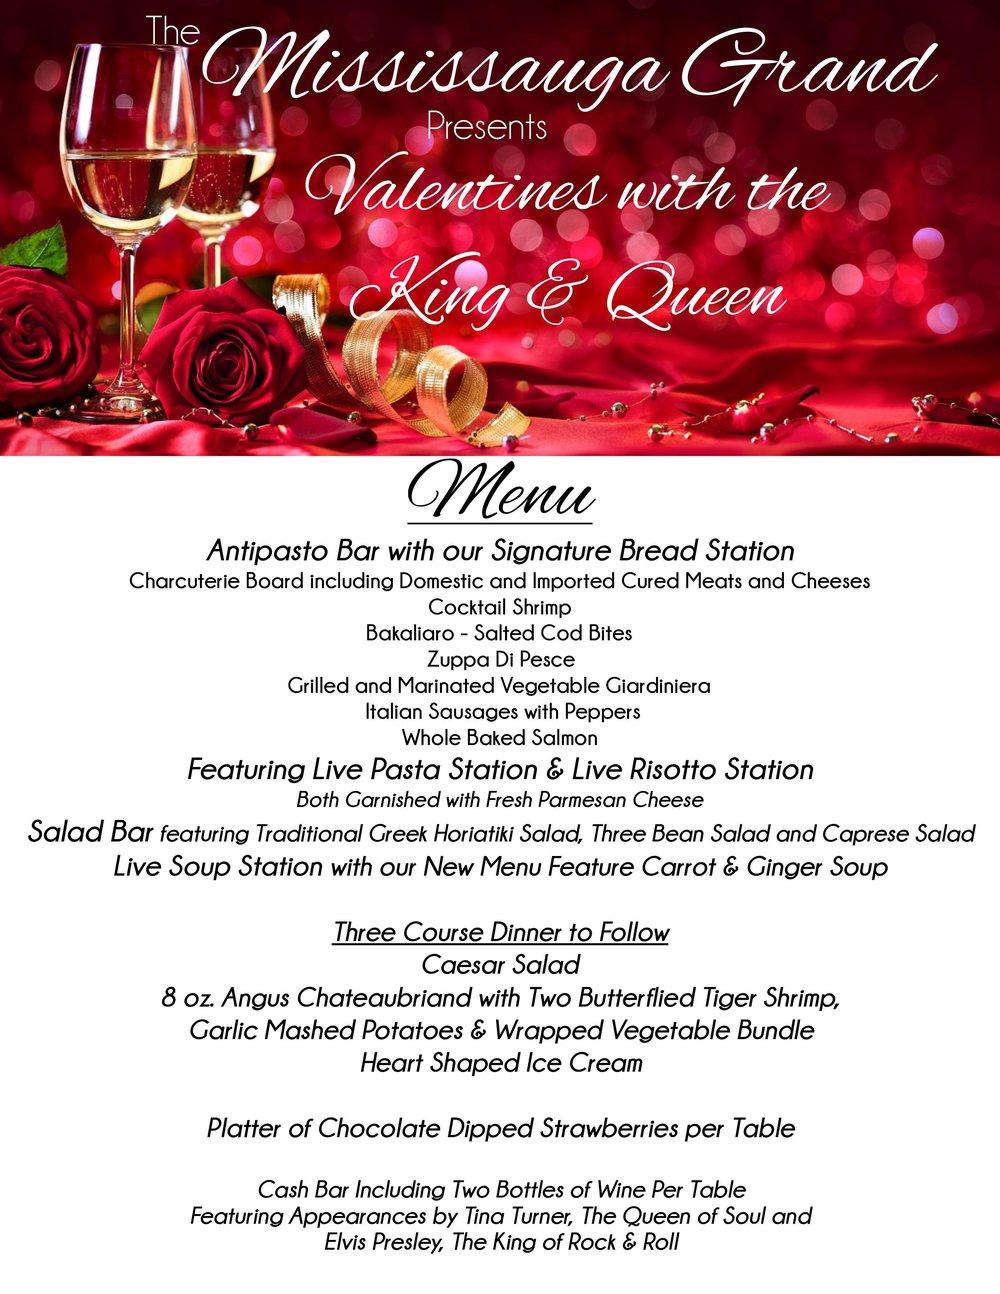 Menu-Mississauga-Grand-Valentines-Dinner-Dance-event-events-February.jpg